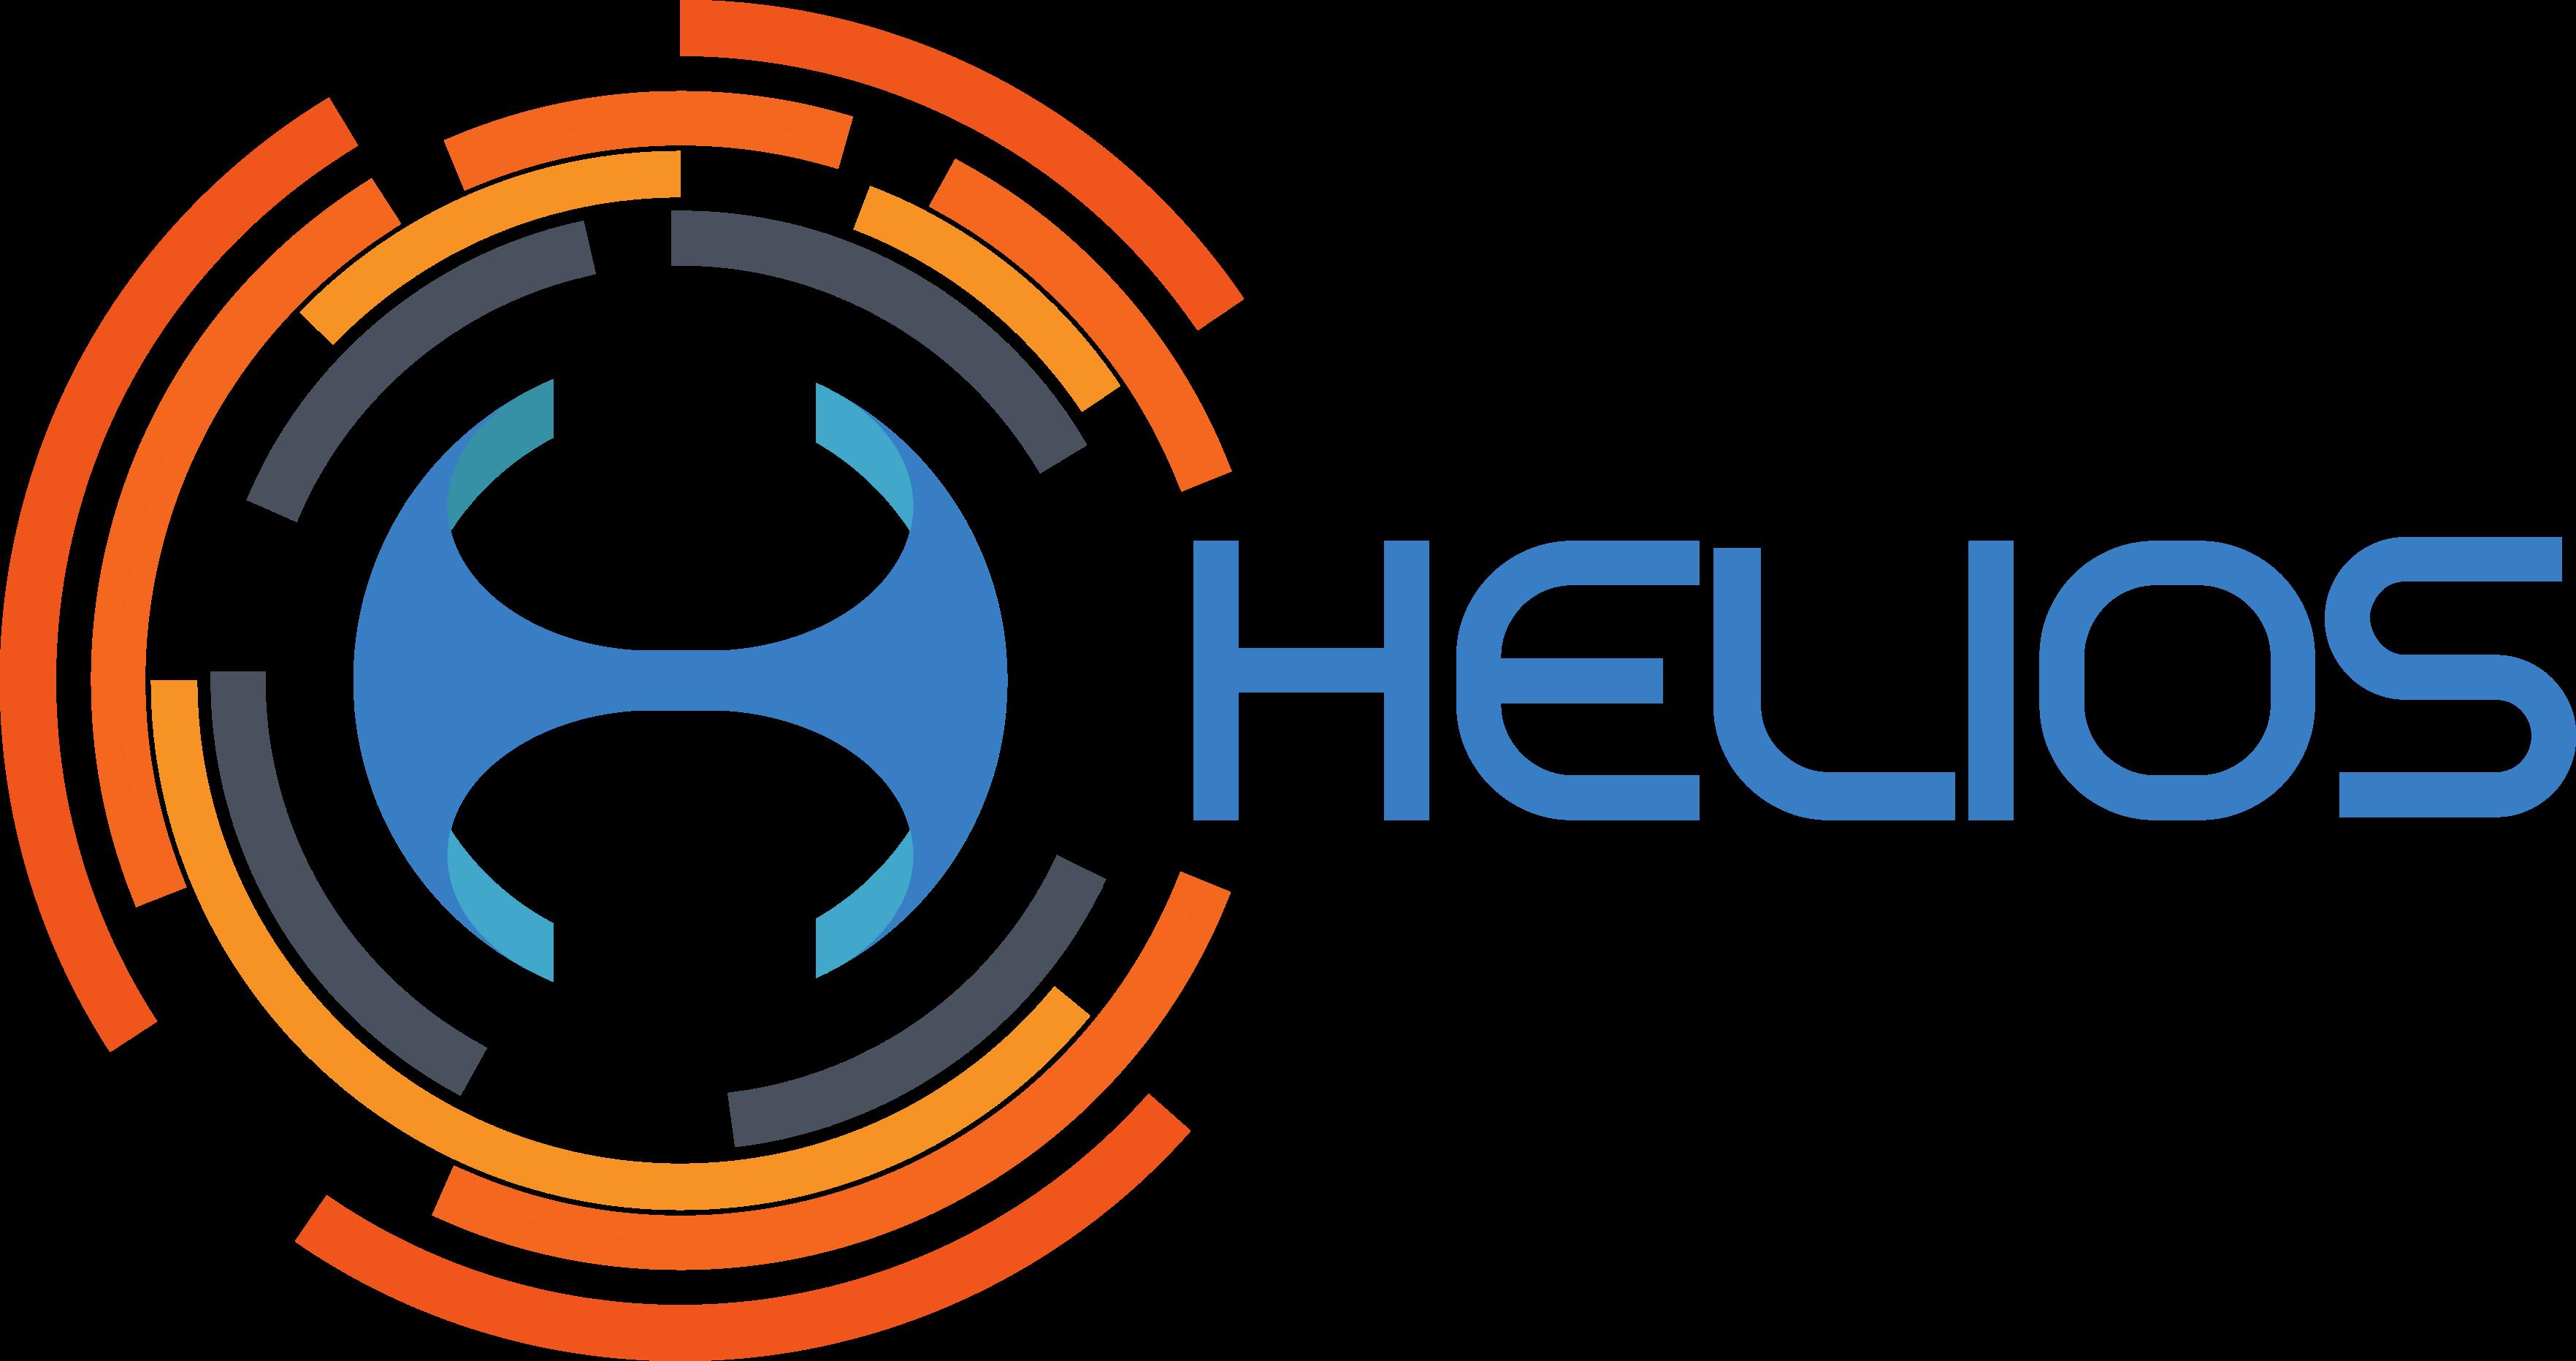 Helios social